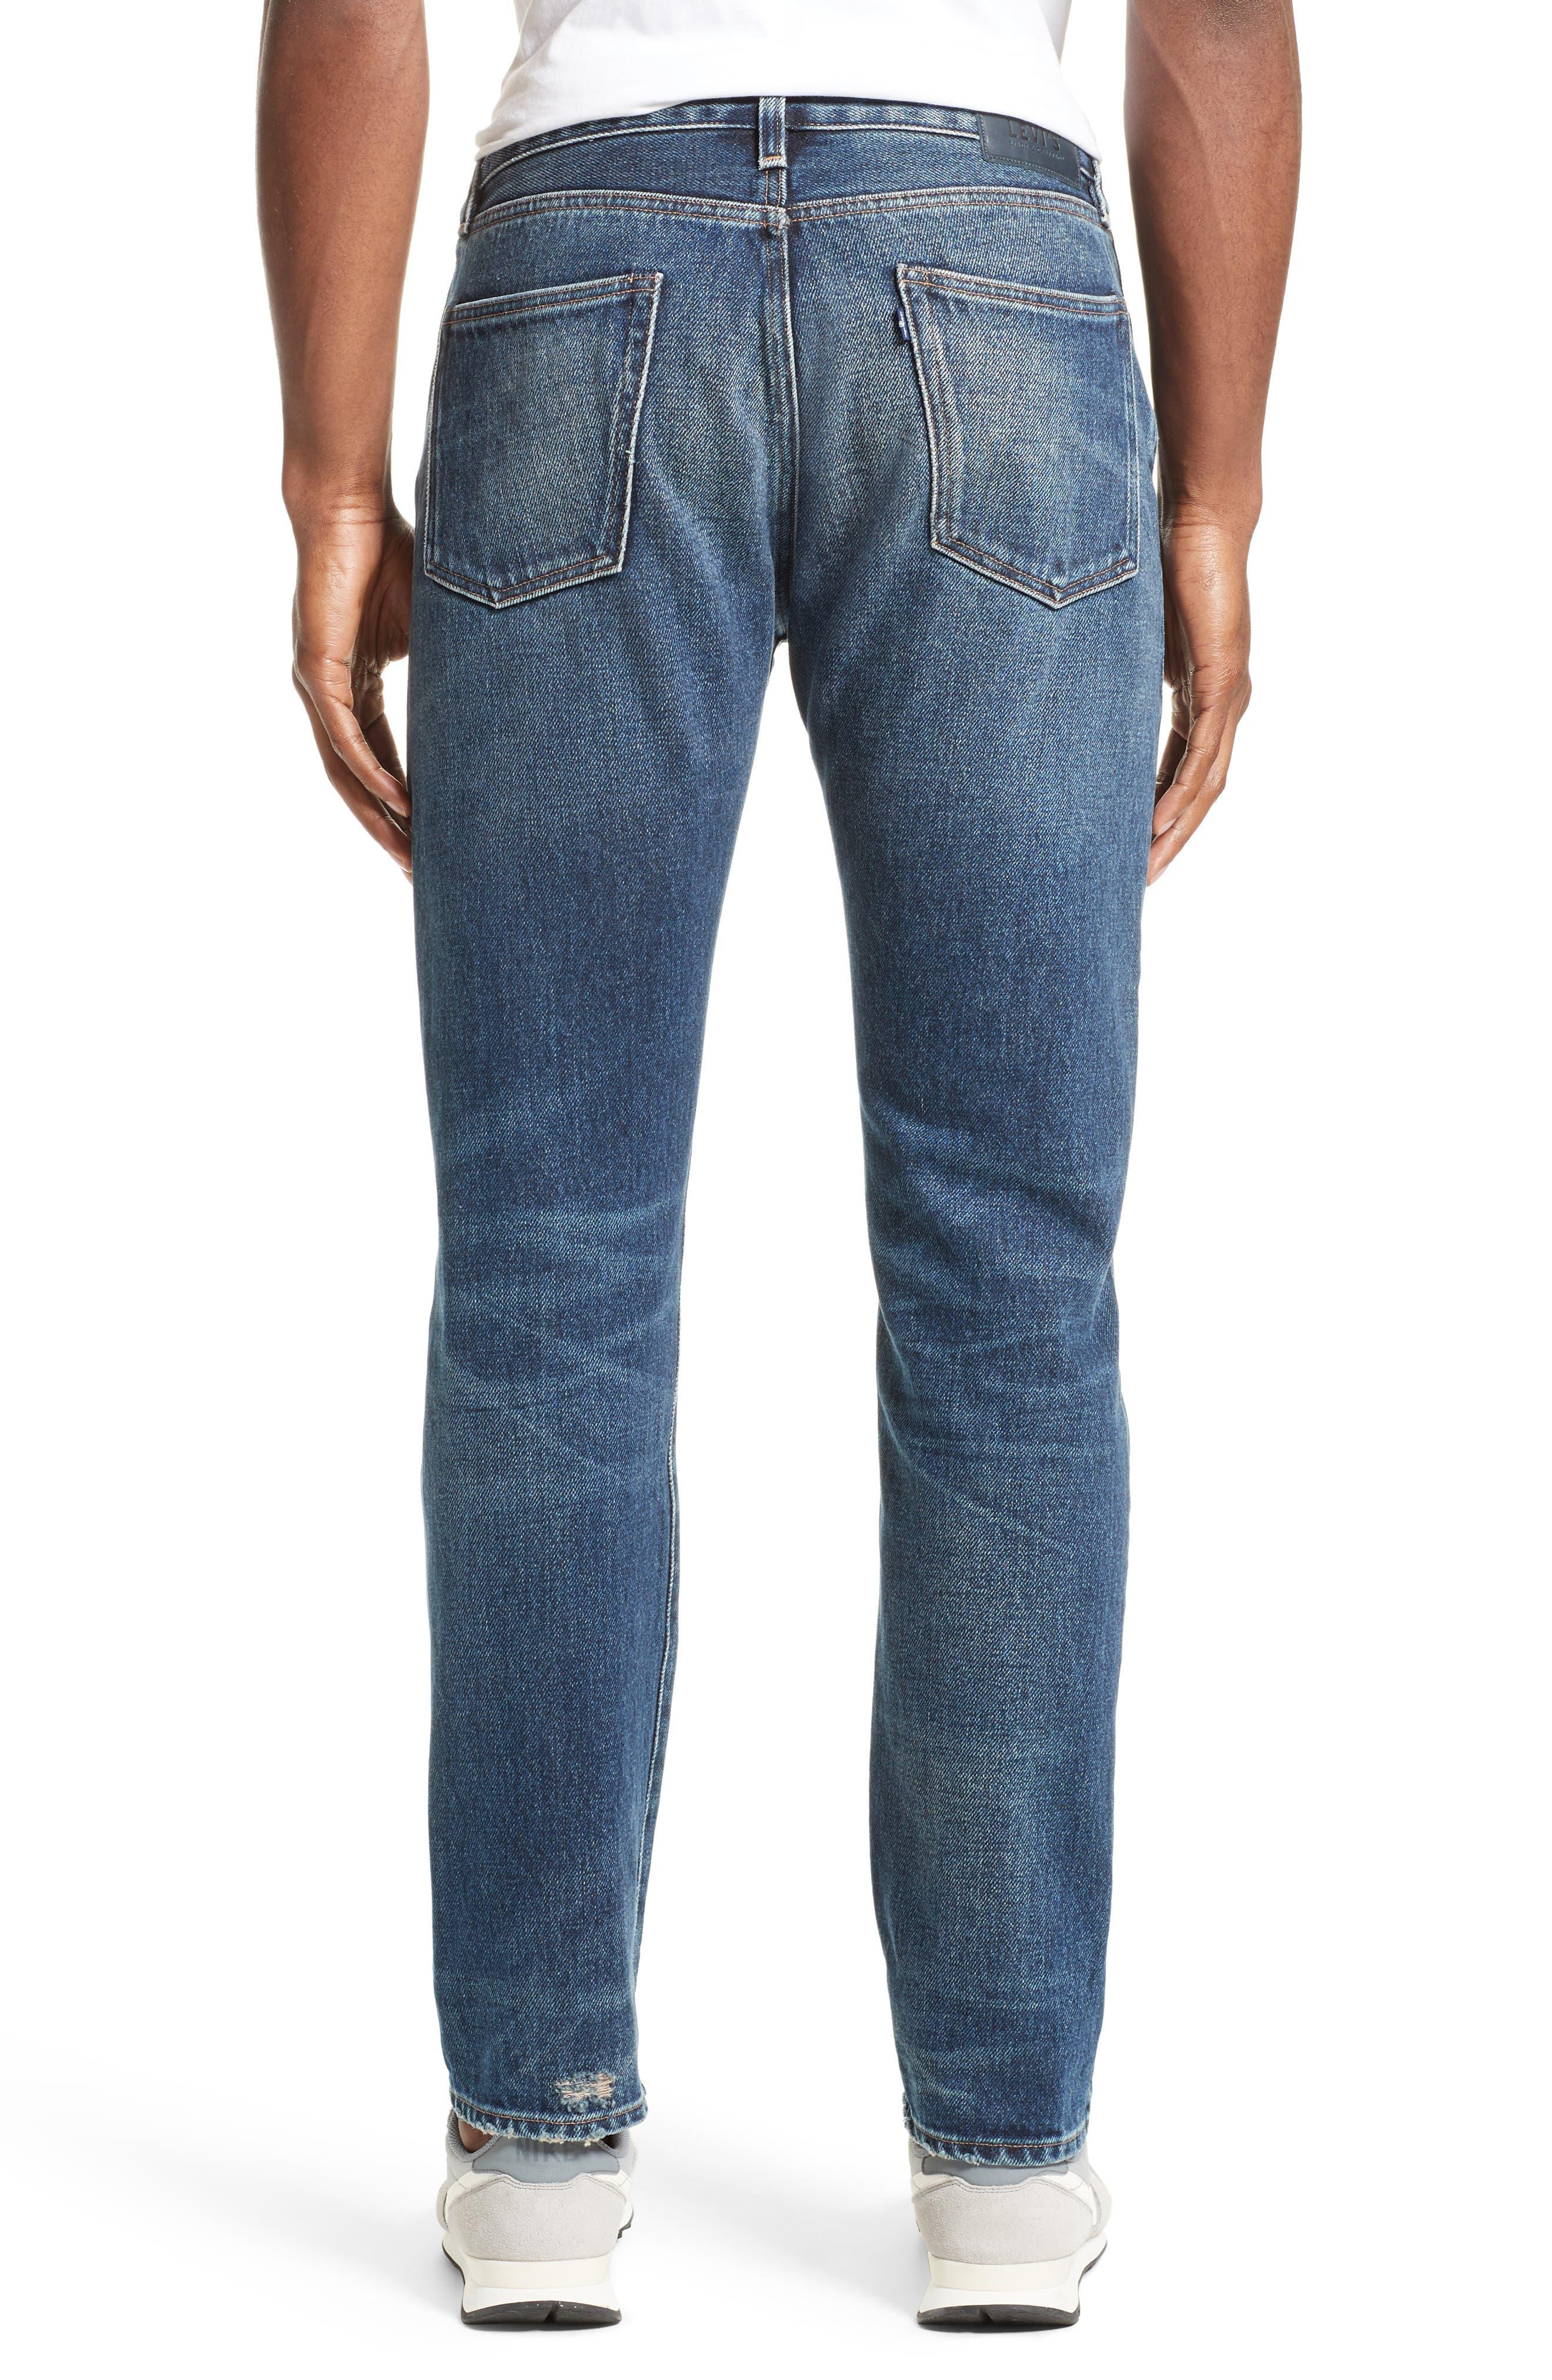 Tack Slim Fit Jeans,                             Alternate thumbnail 2, color,                             420